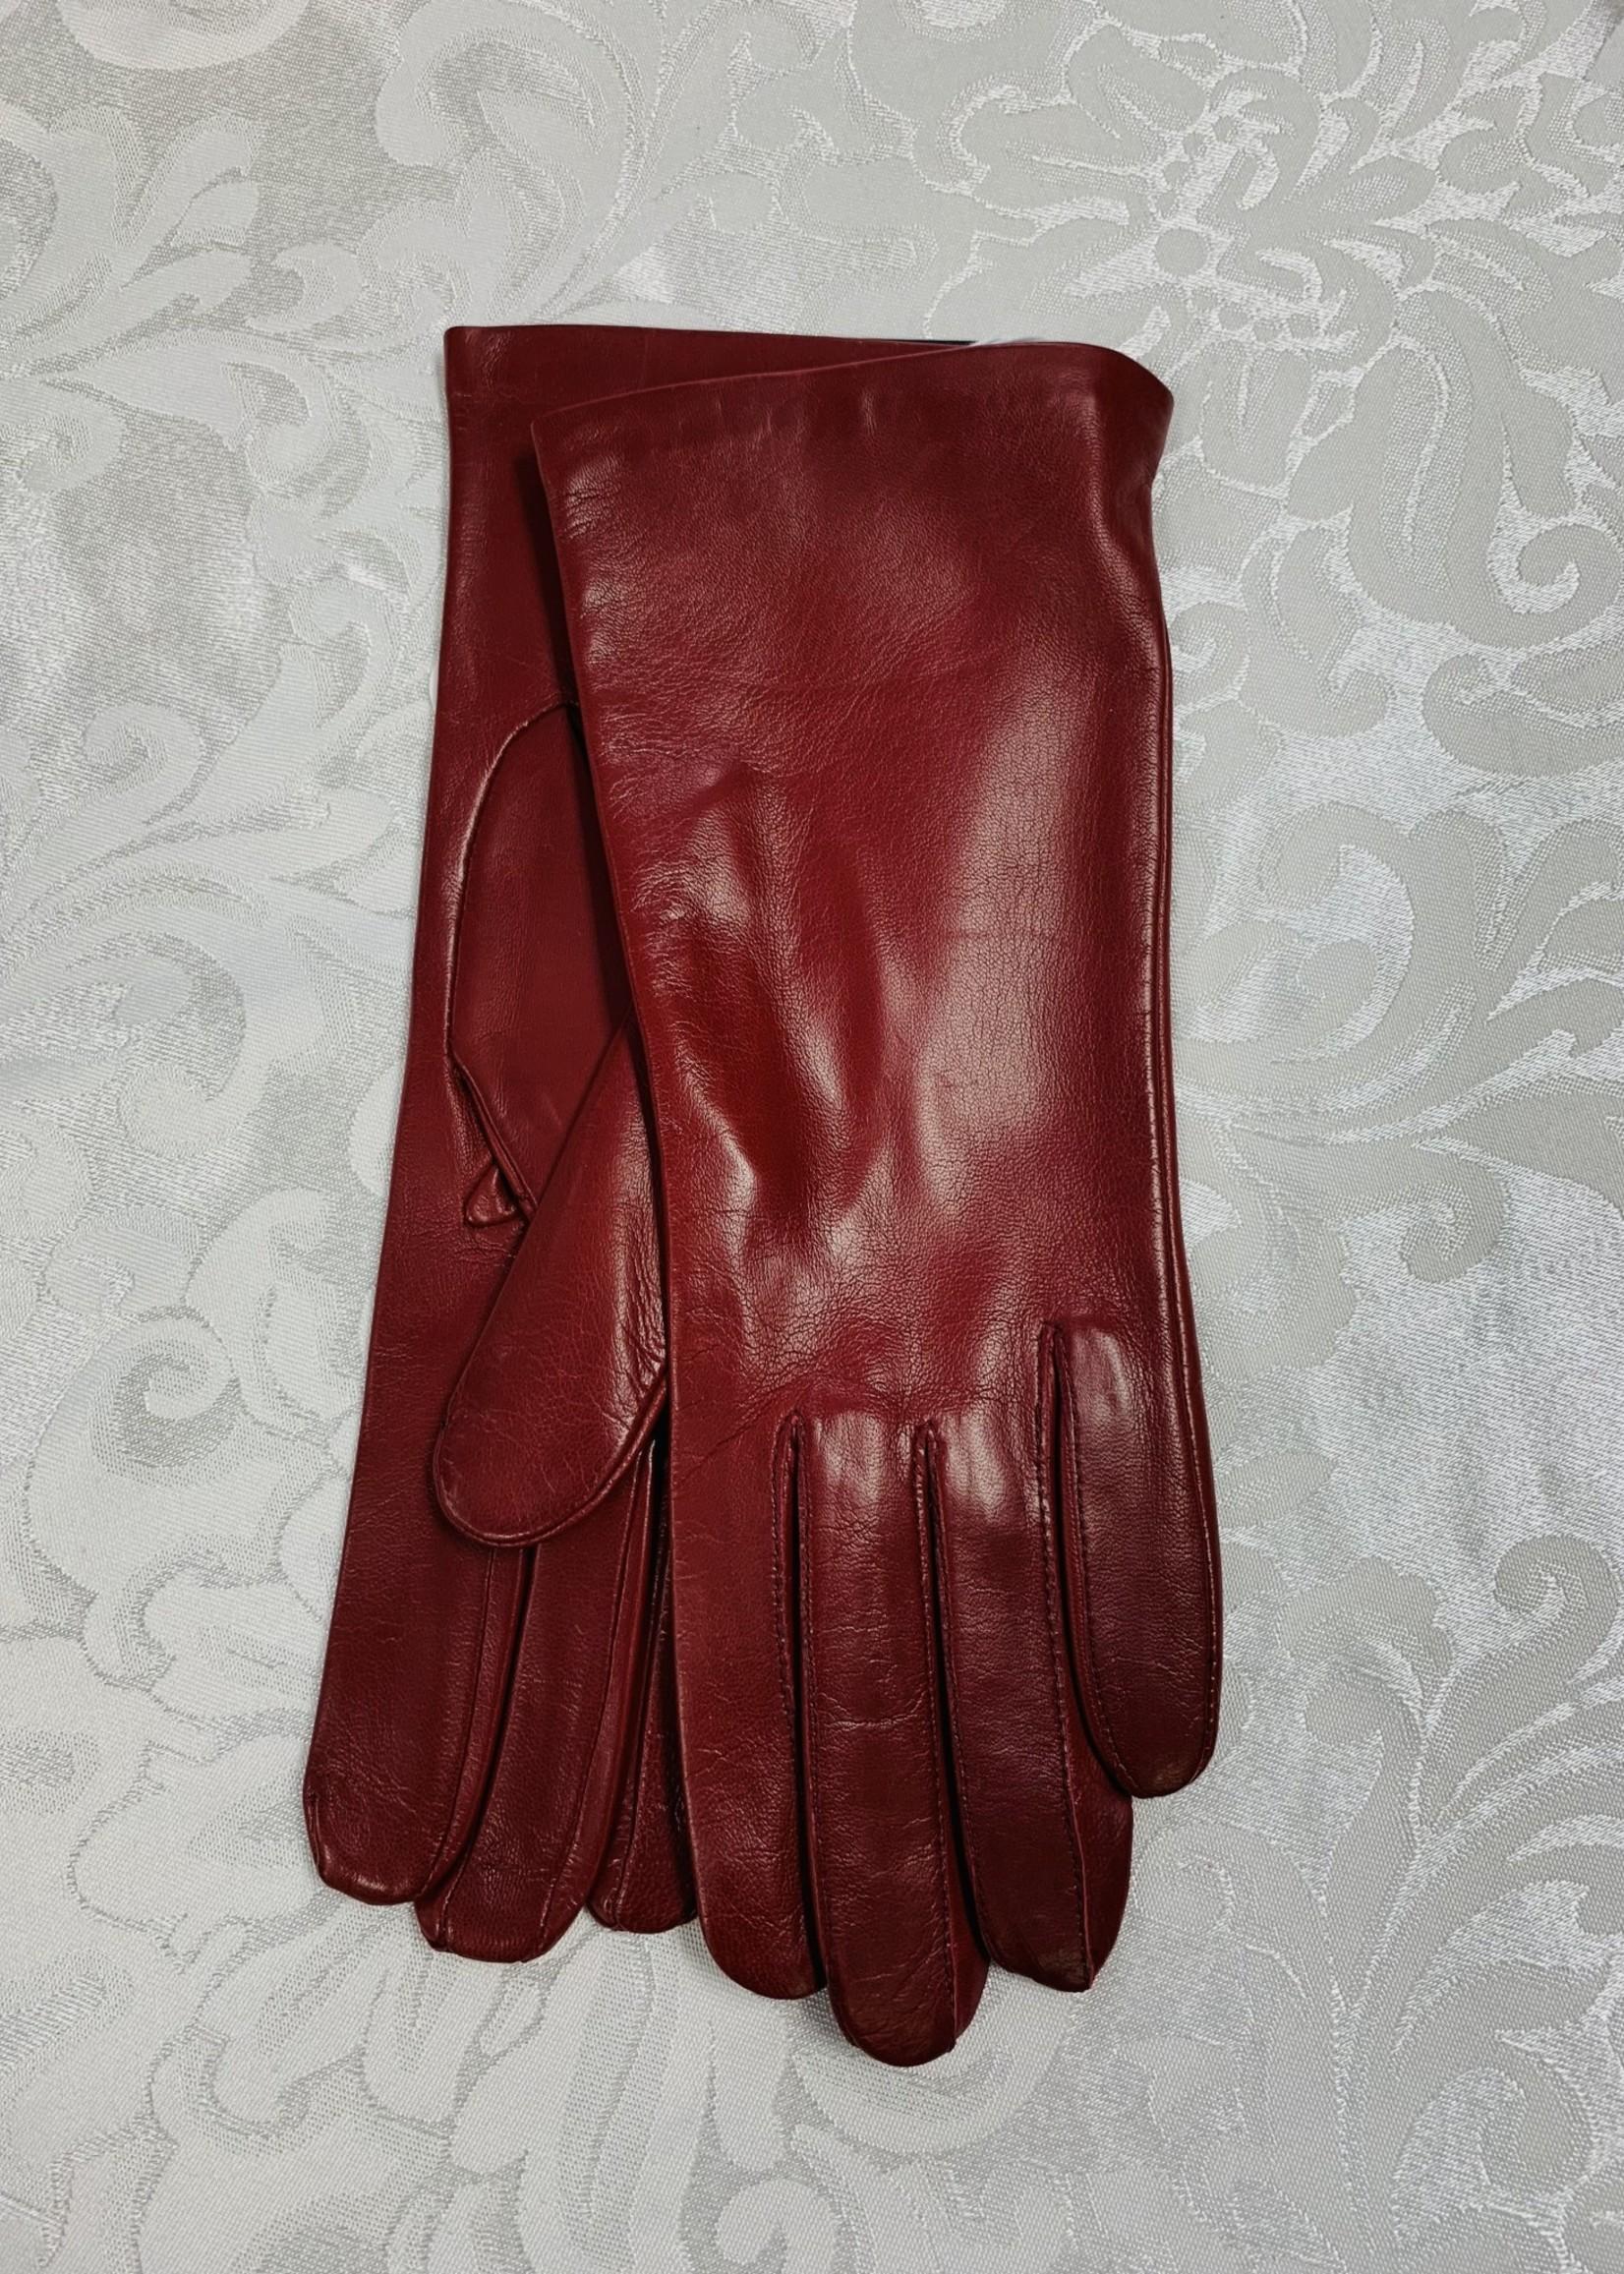 Albee Lambskin Gloves Burgundy